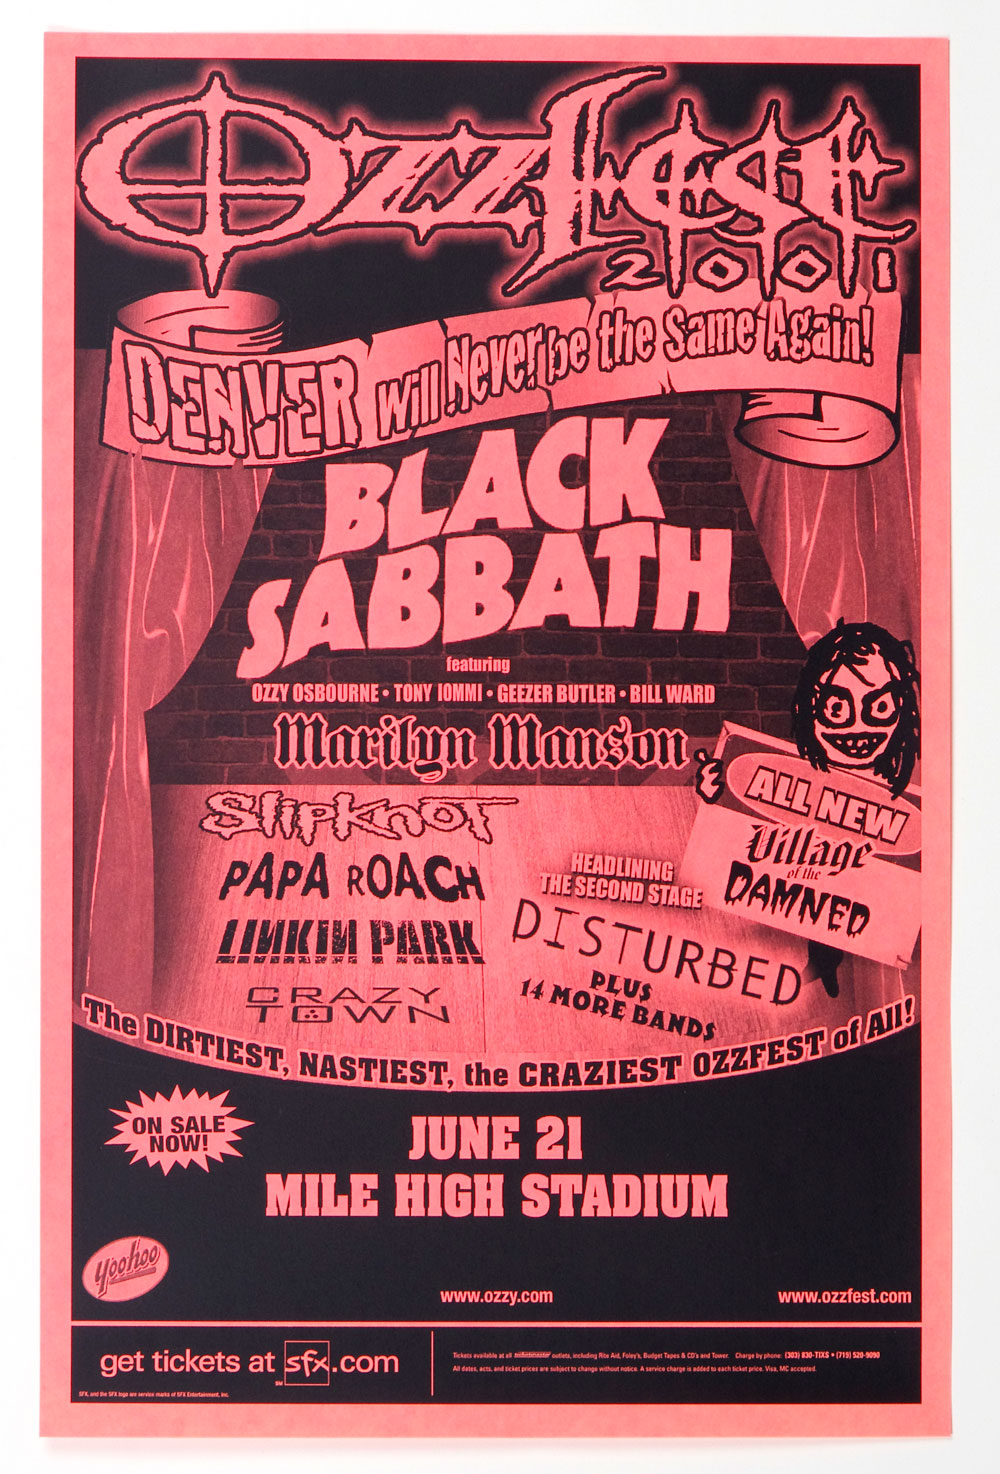 Black Sabbath Poster Ozzfest 2001 Jun 21 Denver